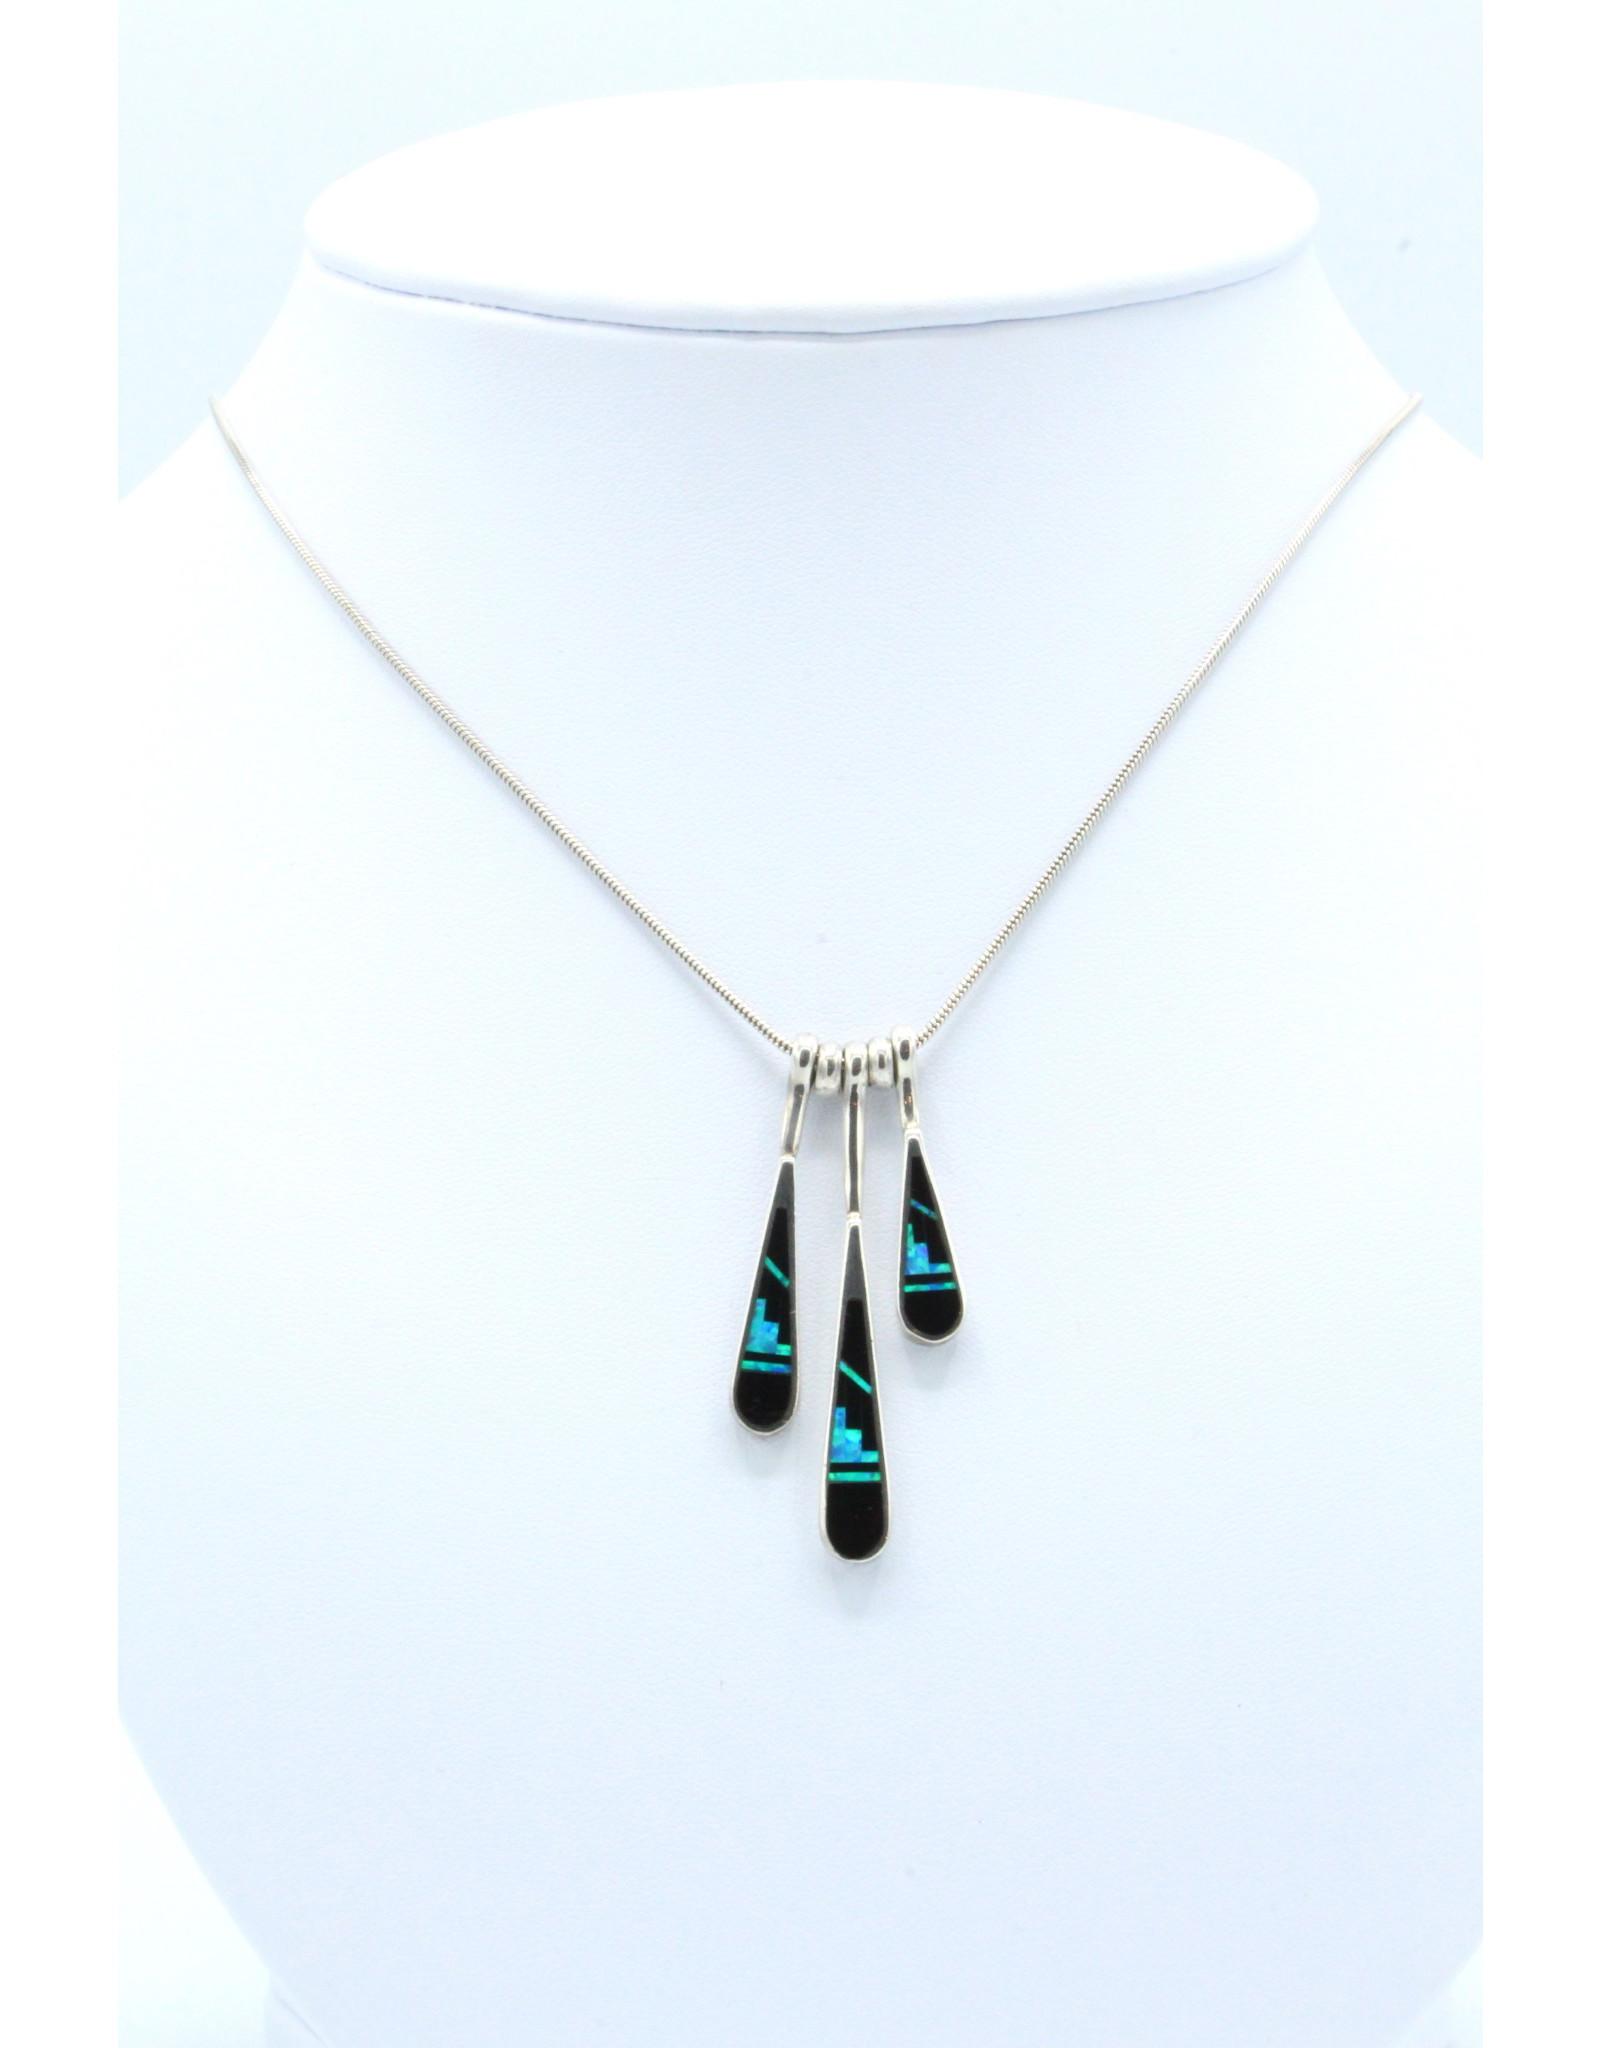 3 Tear Necklace - N-108-42